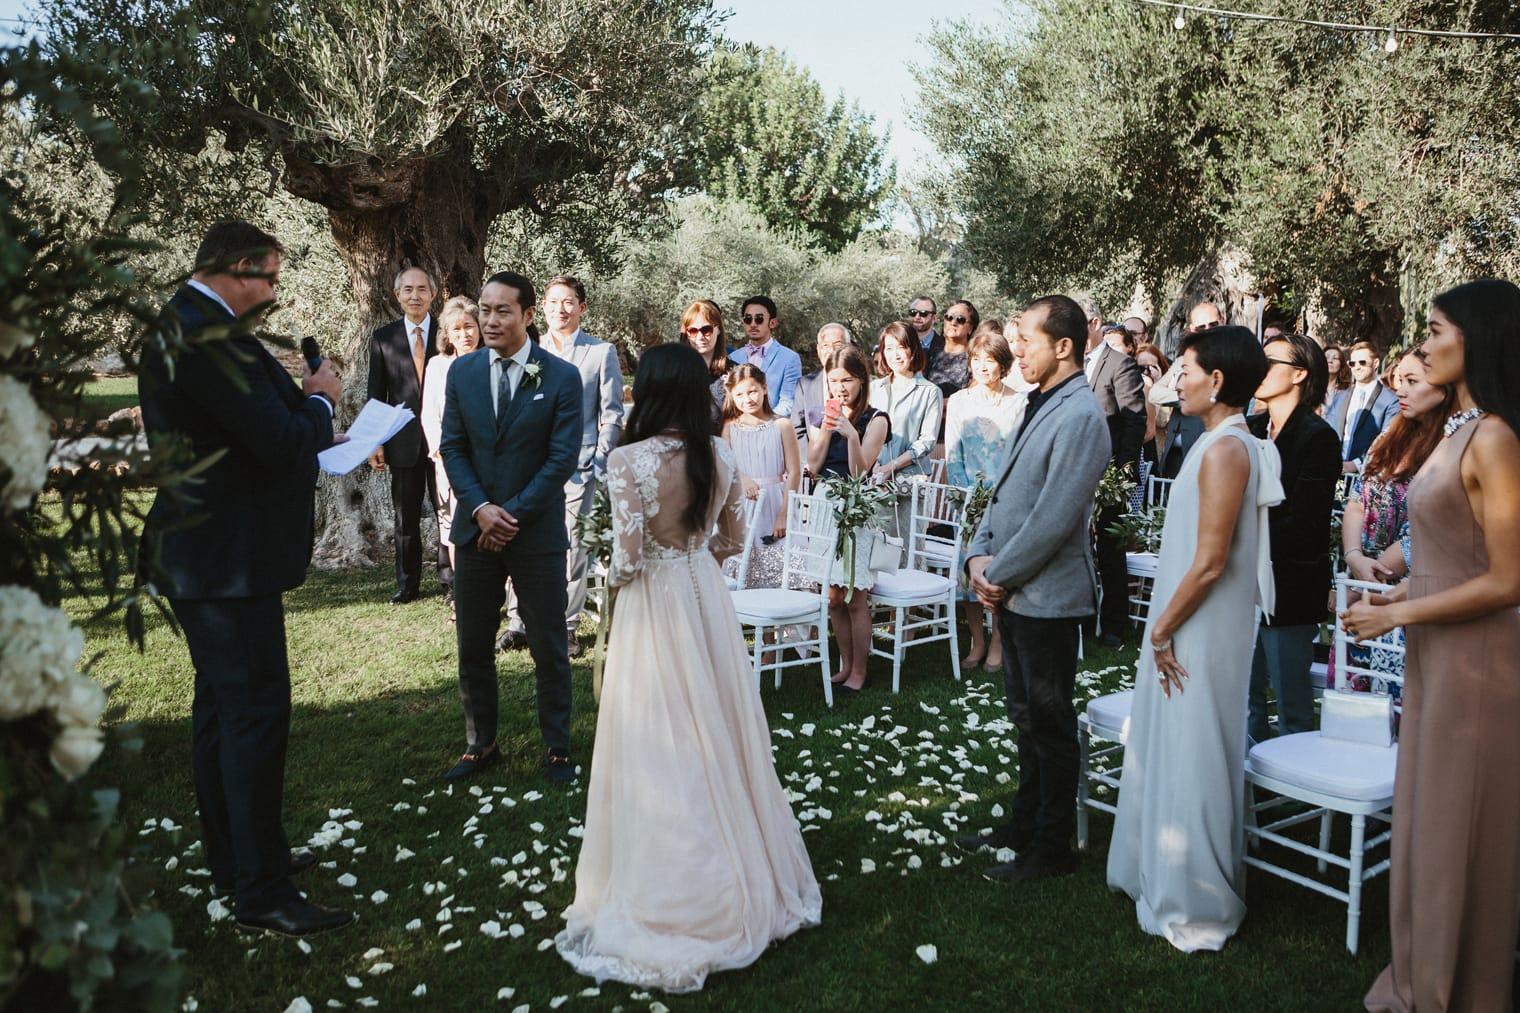 Puglia wedding ceremony at masseria torre coccaro wedding venue